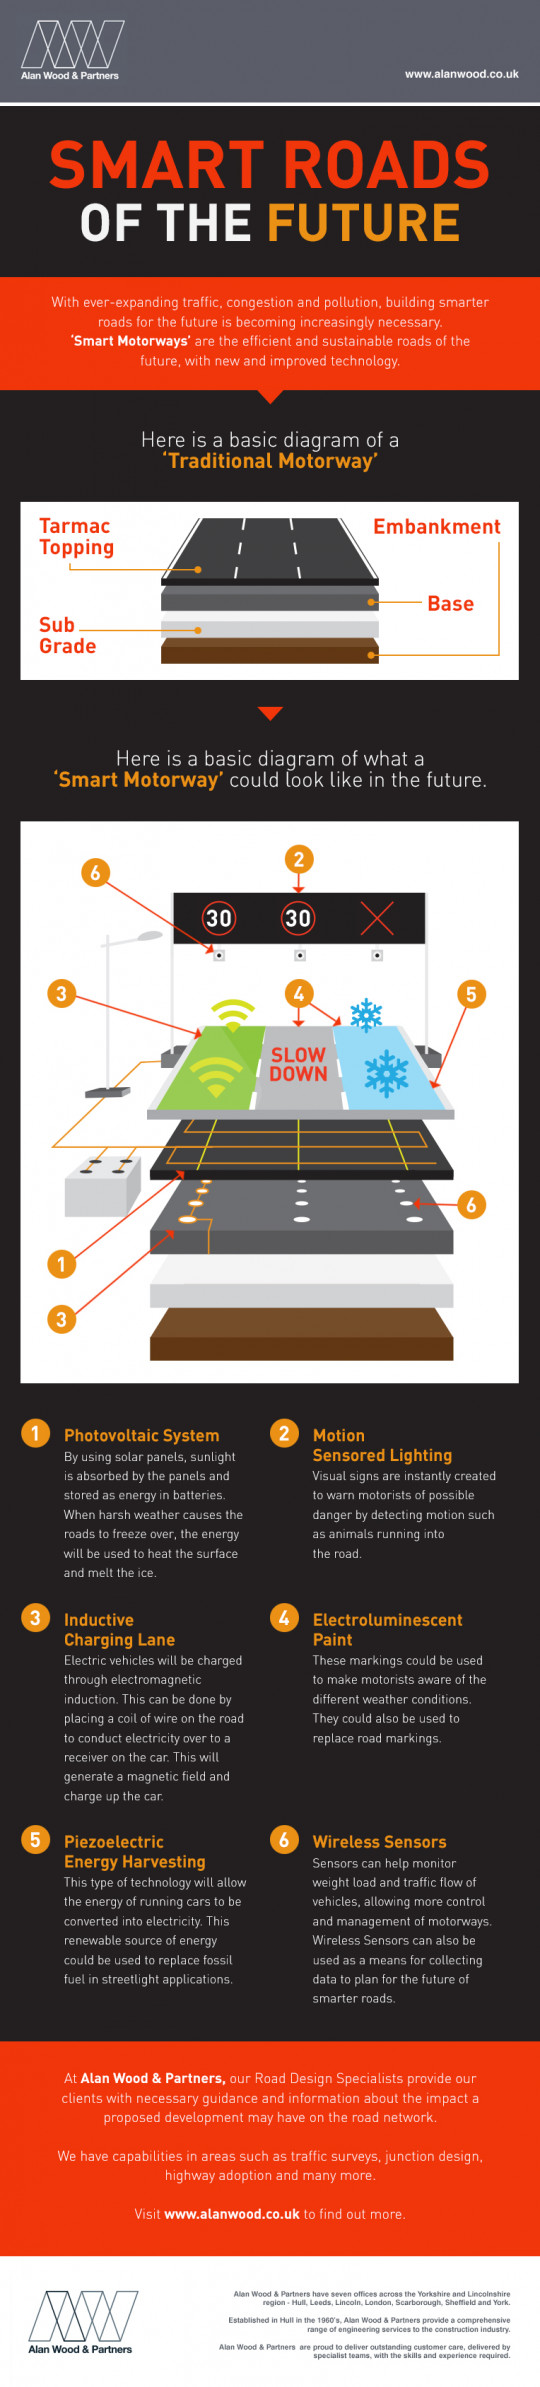 Smart Roads of the Future